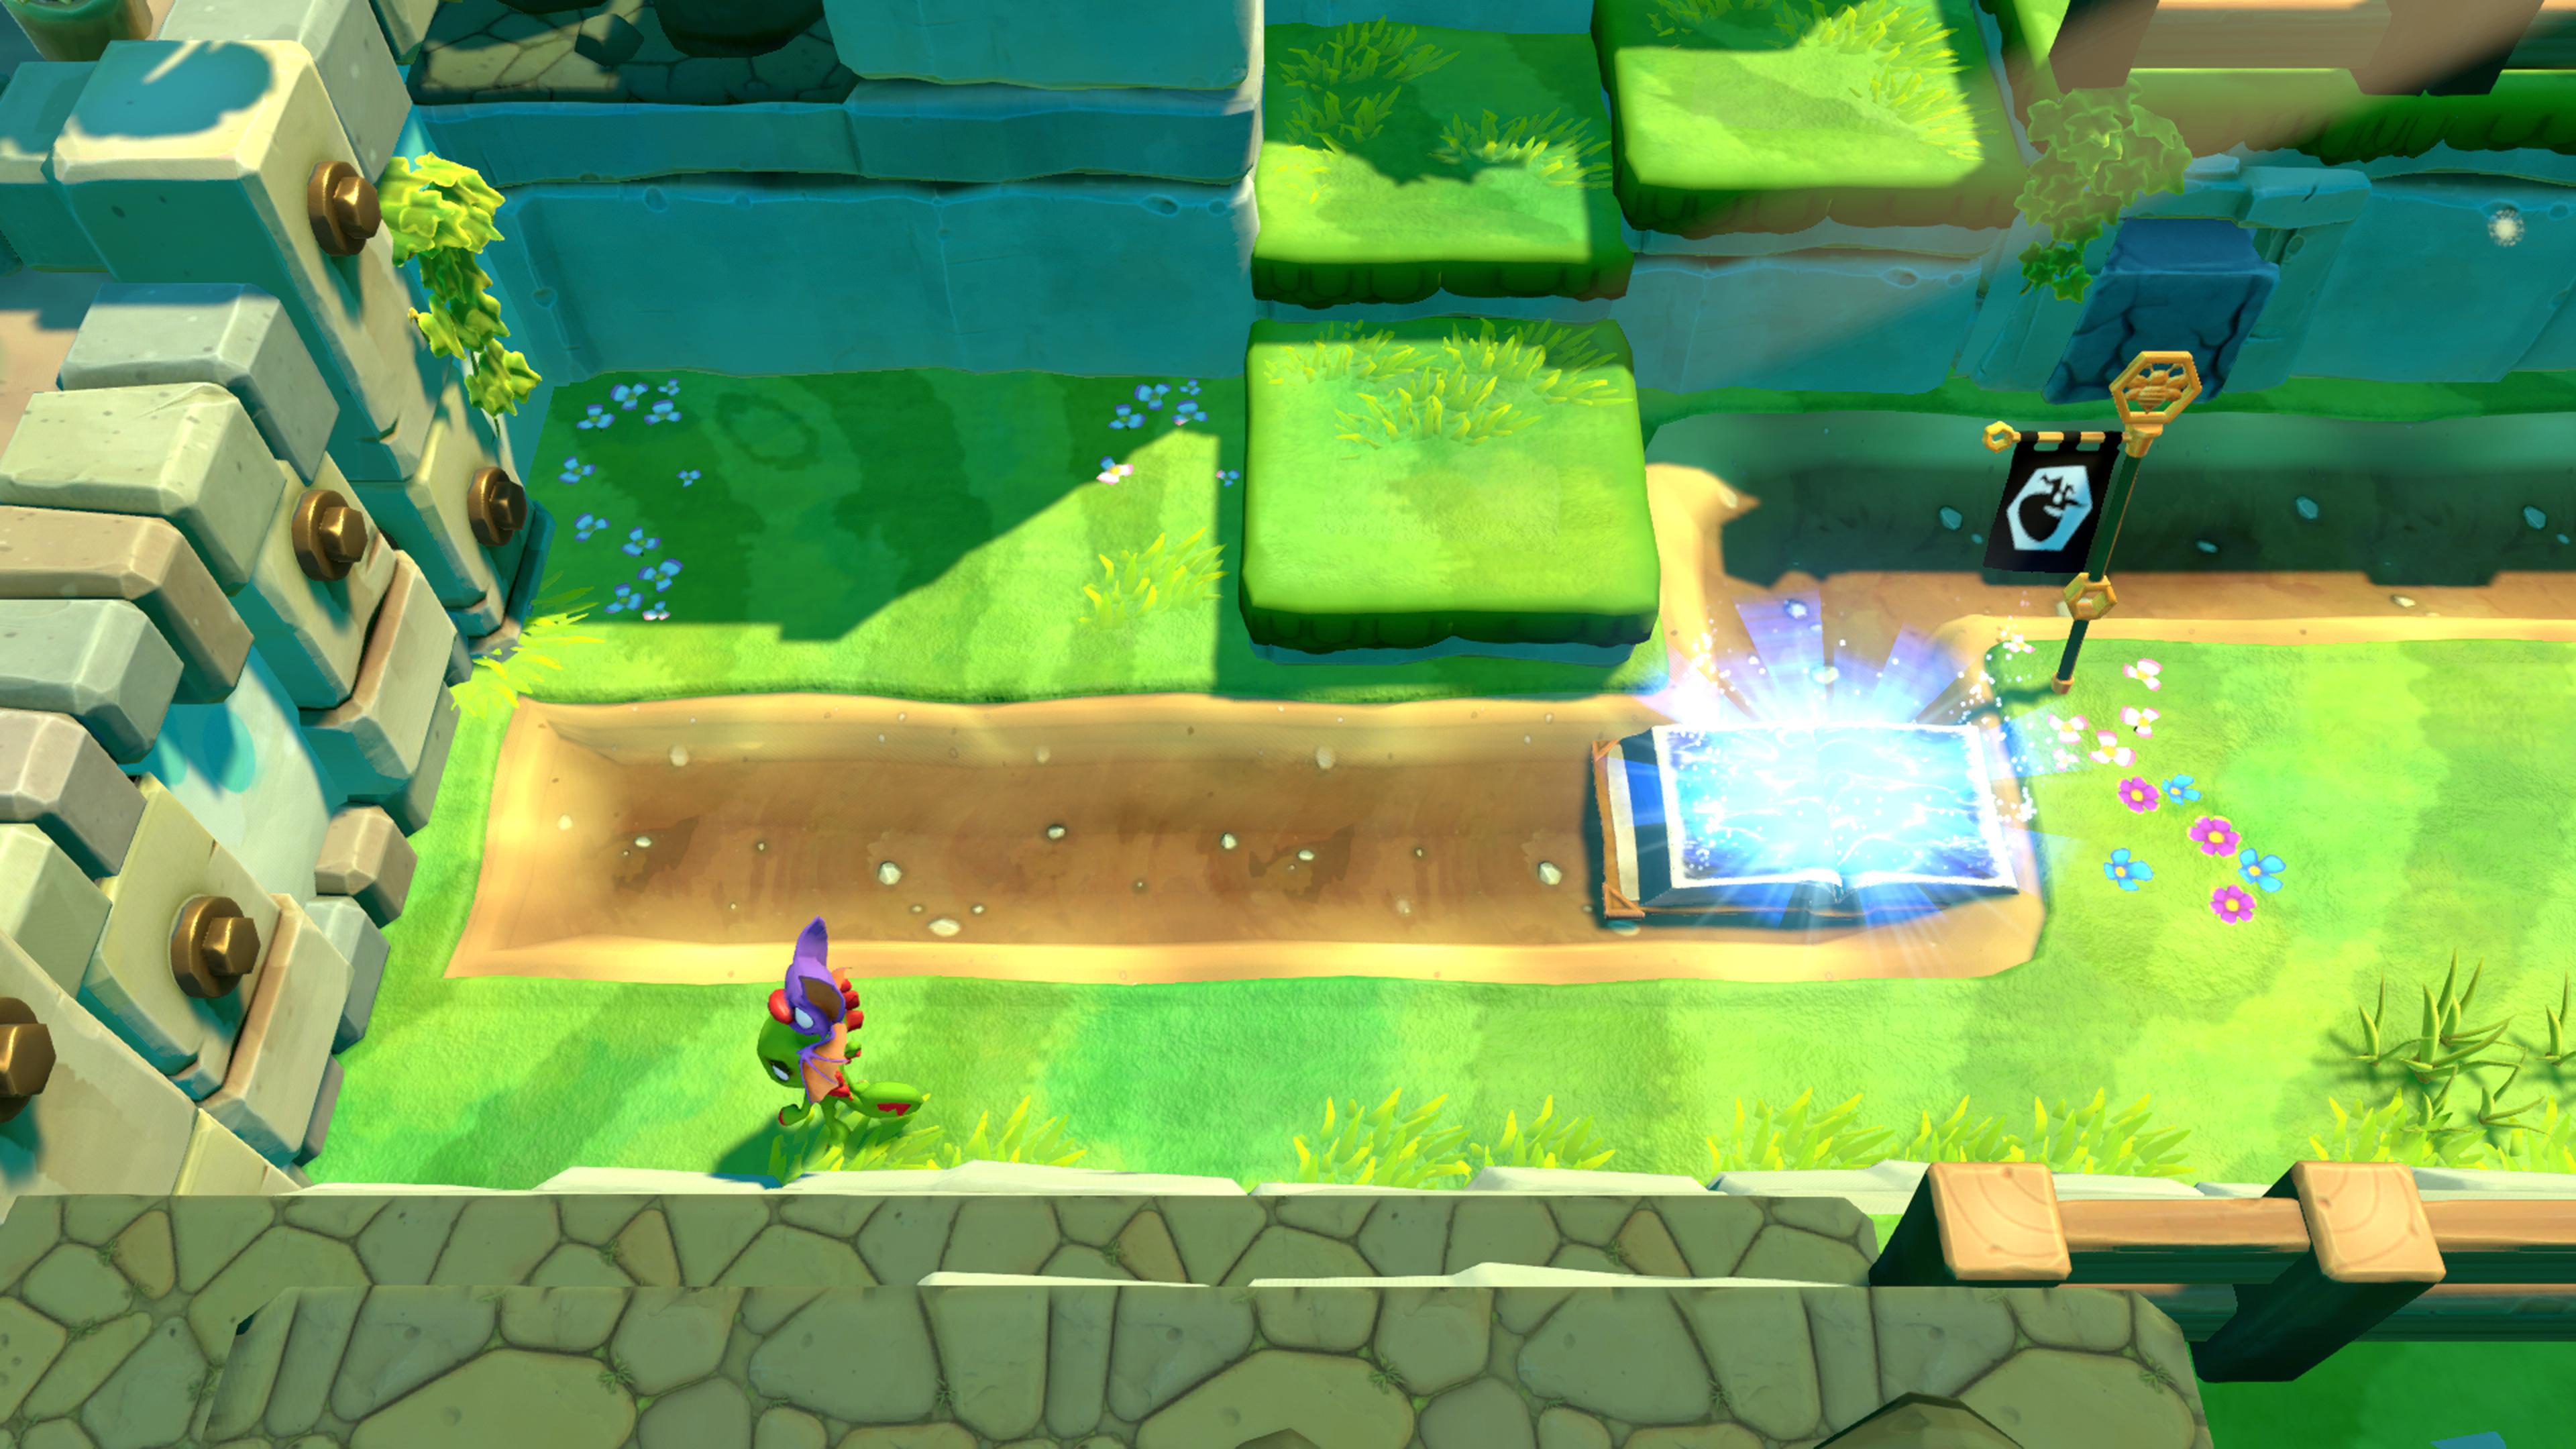 Yooka-Laylee and the Impossible Lair: Sympatická skákačka dostupná v rámci predplatného Game Pass.